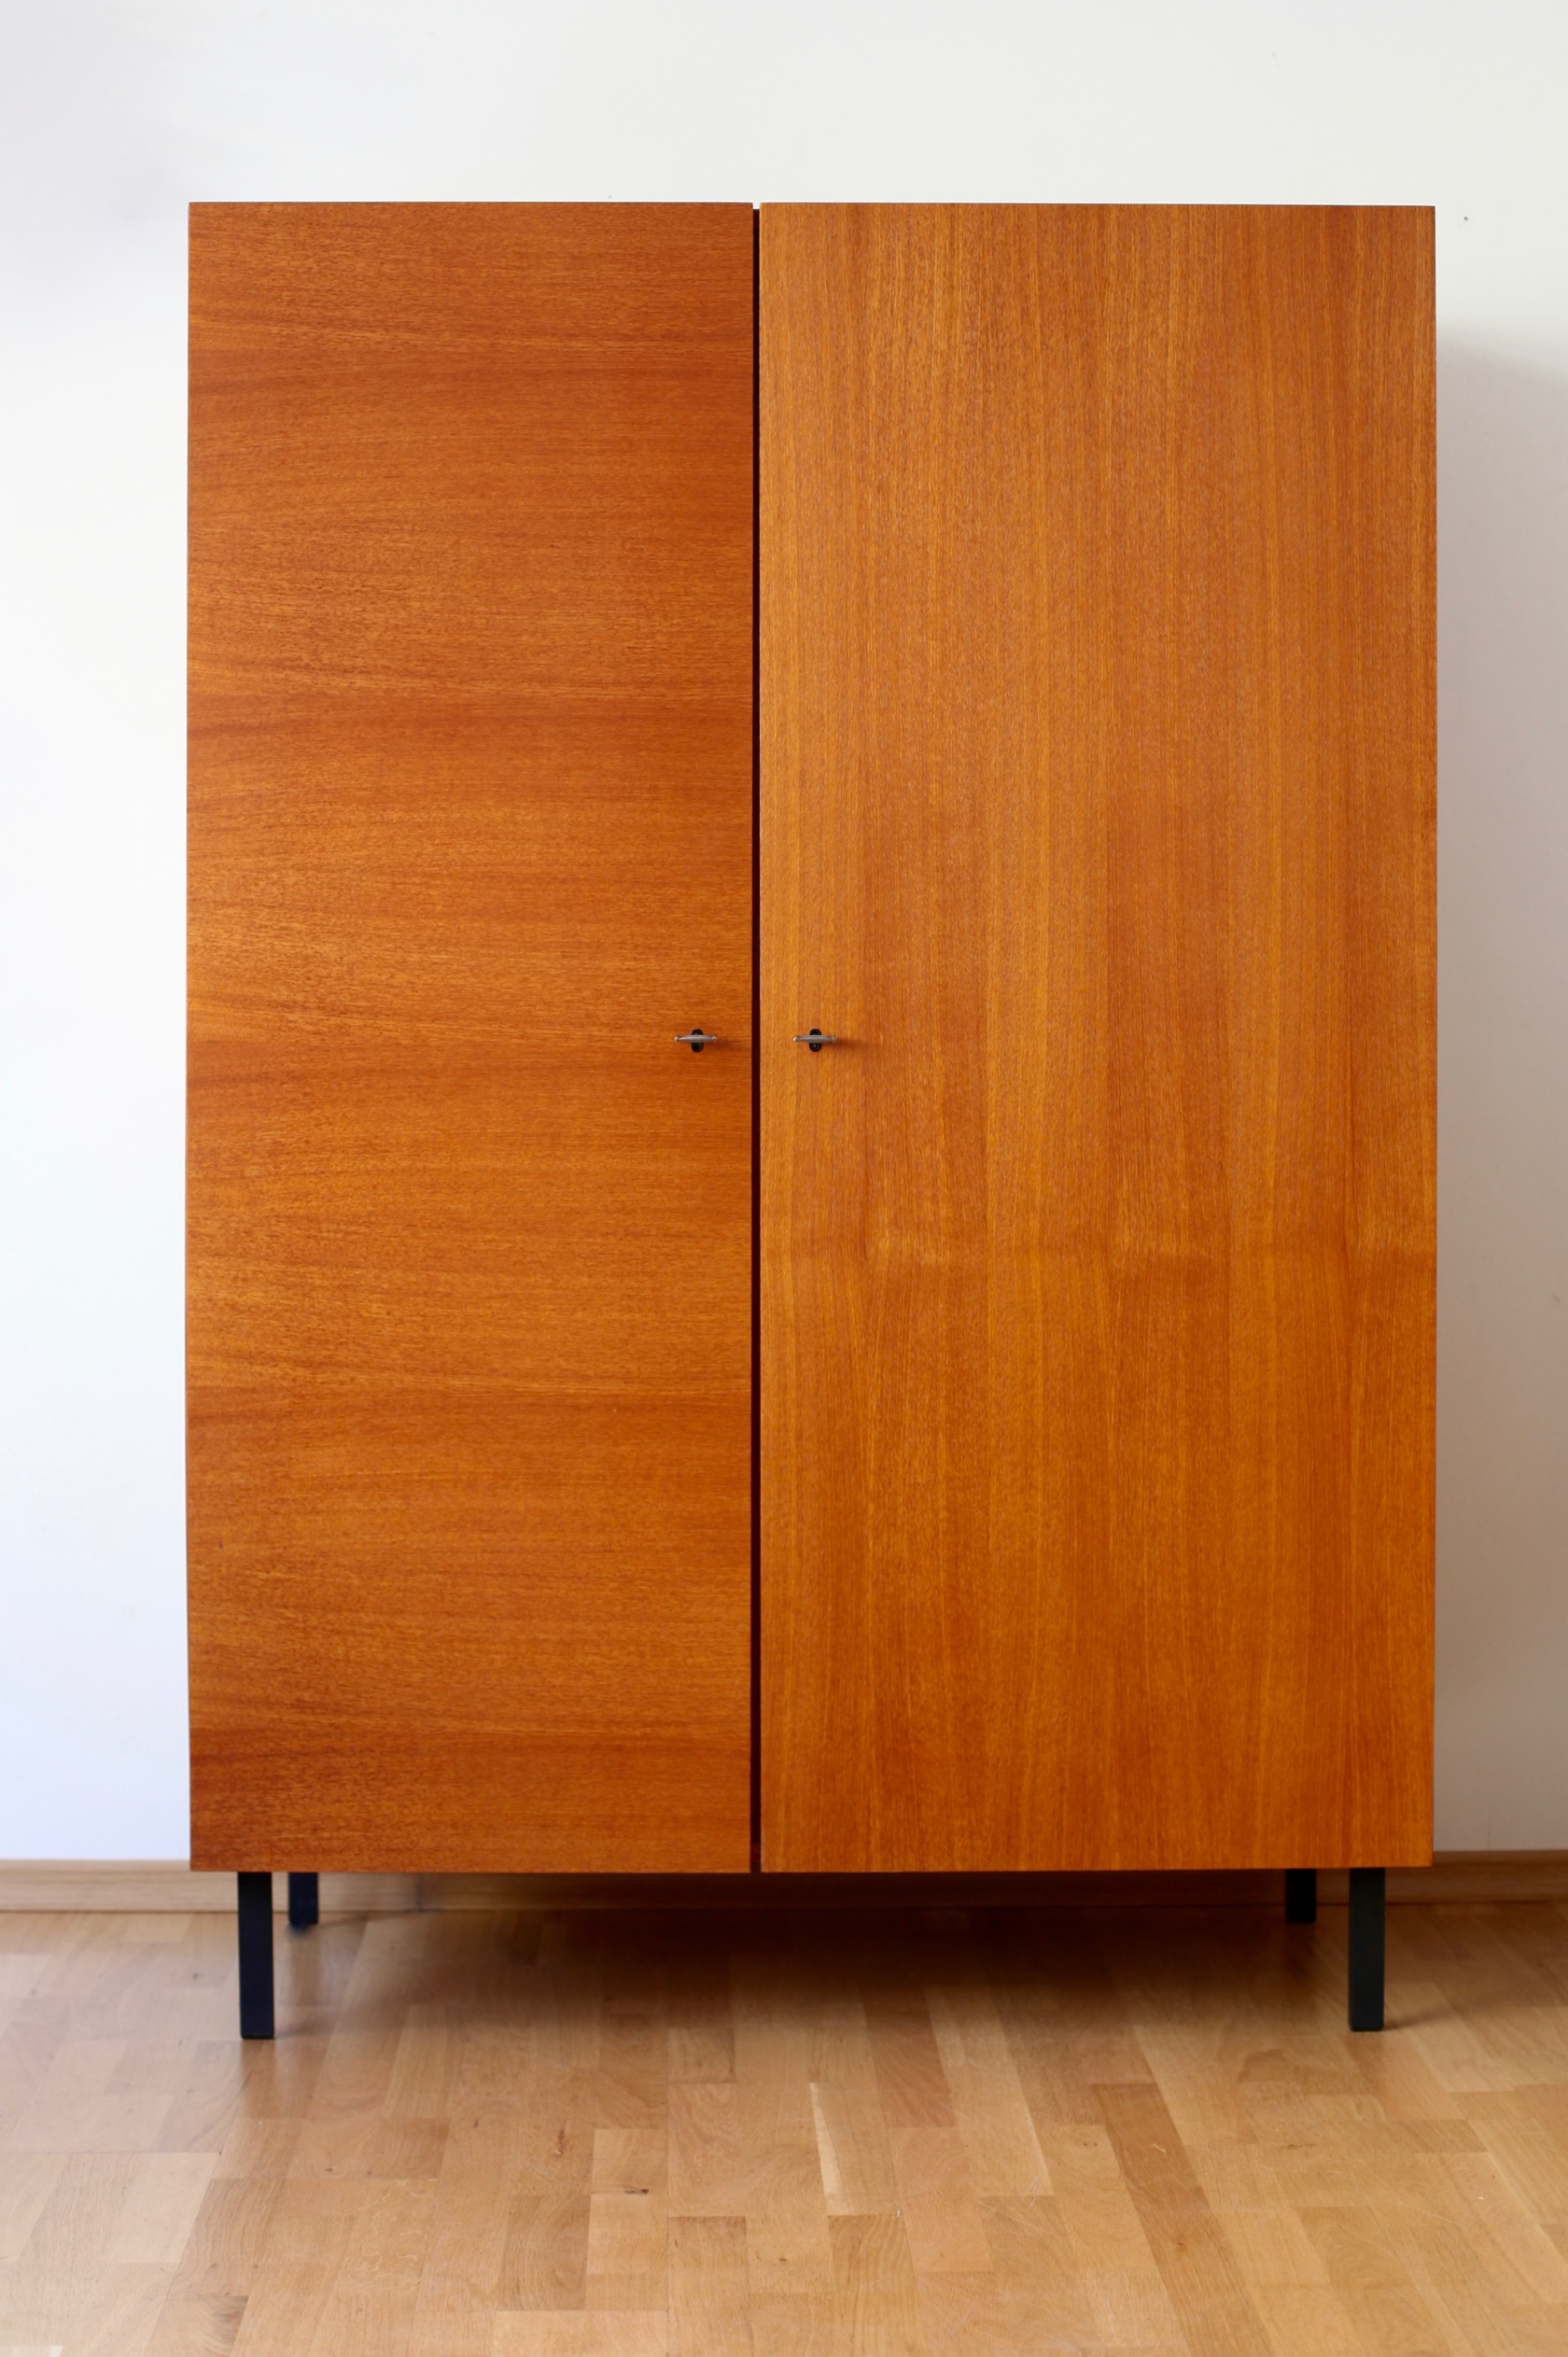 charmant musterring schrank galerie die besten wohnideen. Black Bedroom Furniture Sets. Home Design Ideas